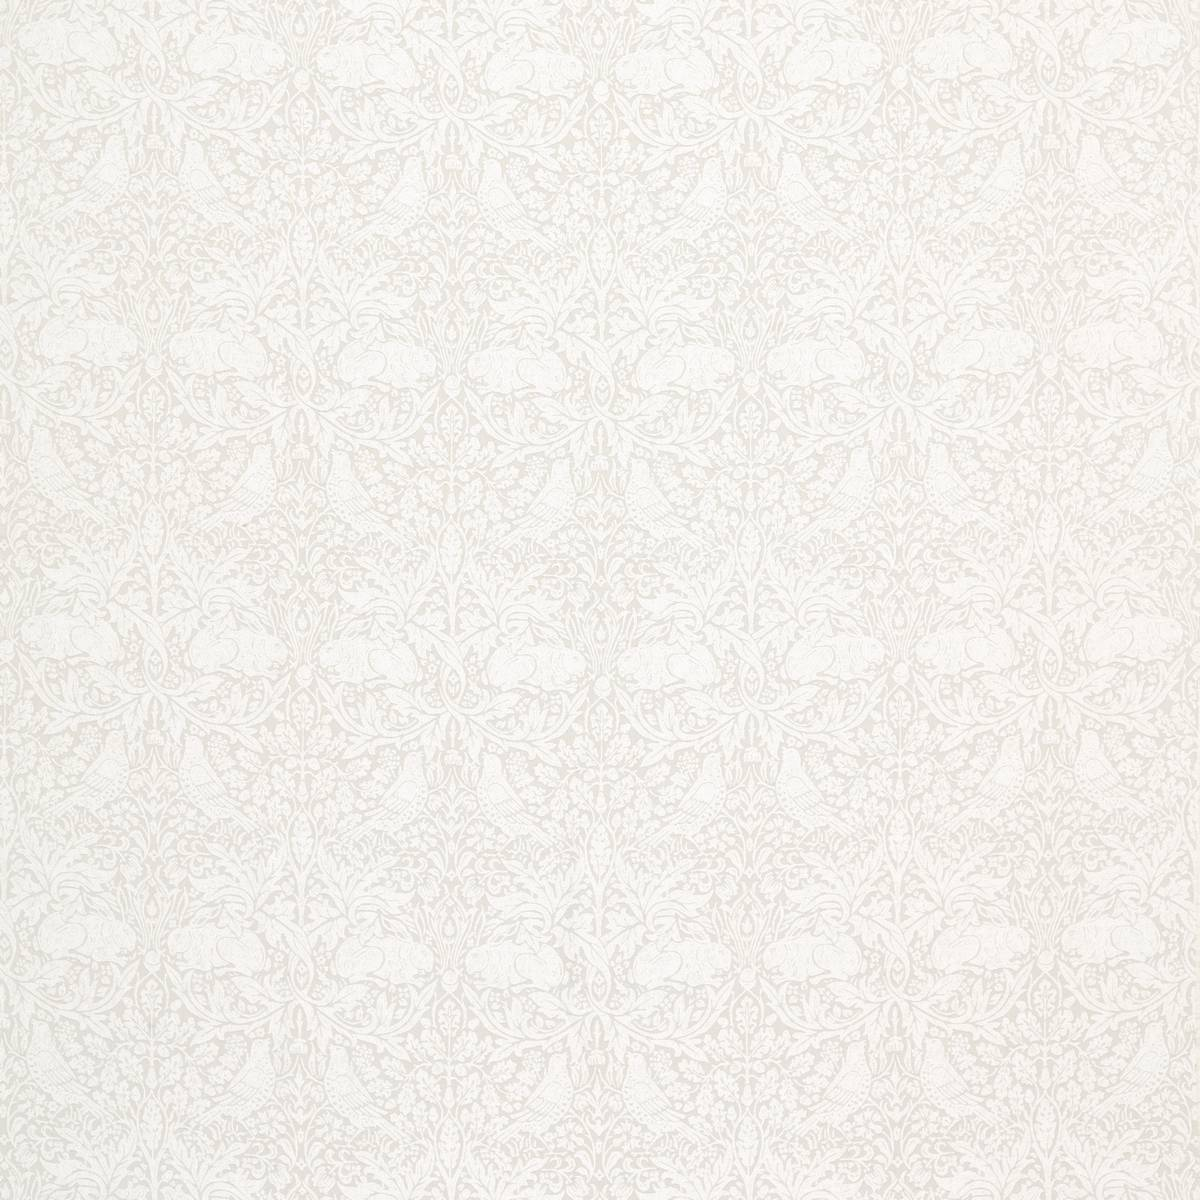 Pure Brer Rabbit Weave Linen By William Morris Amp Co